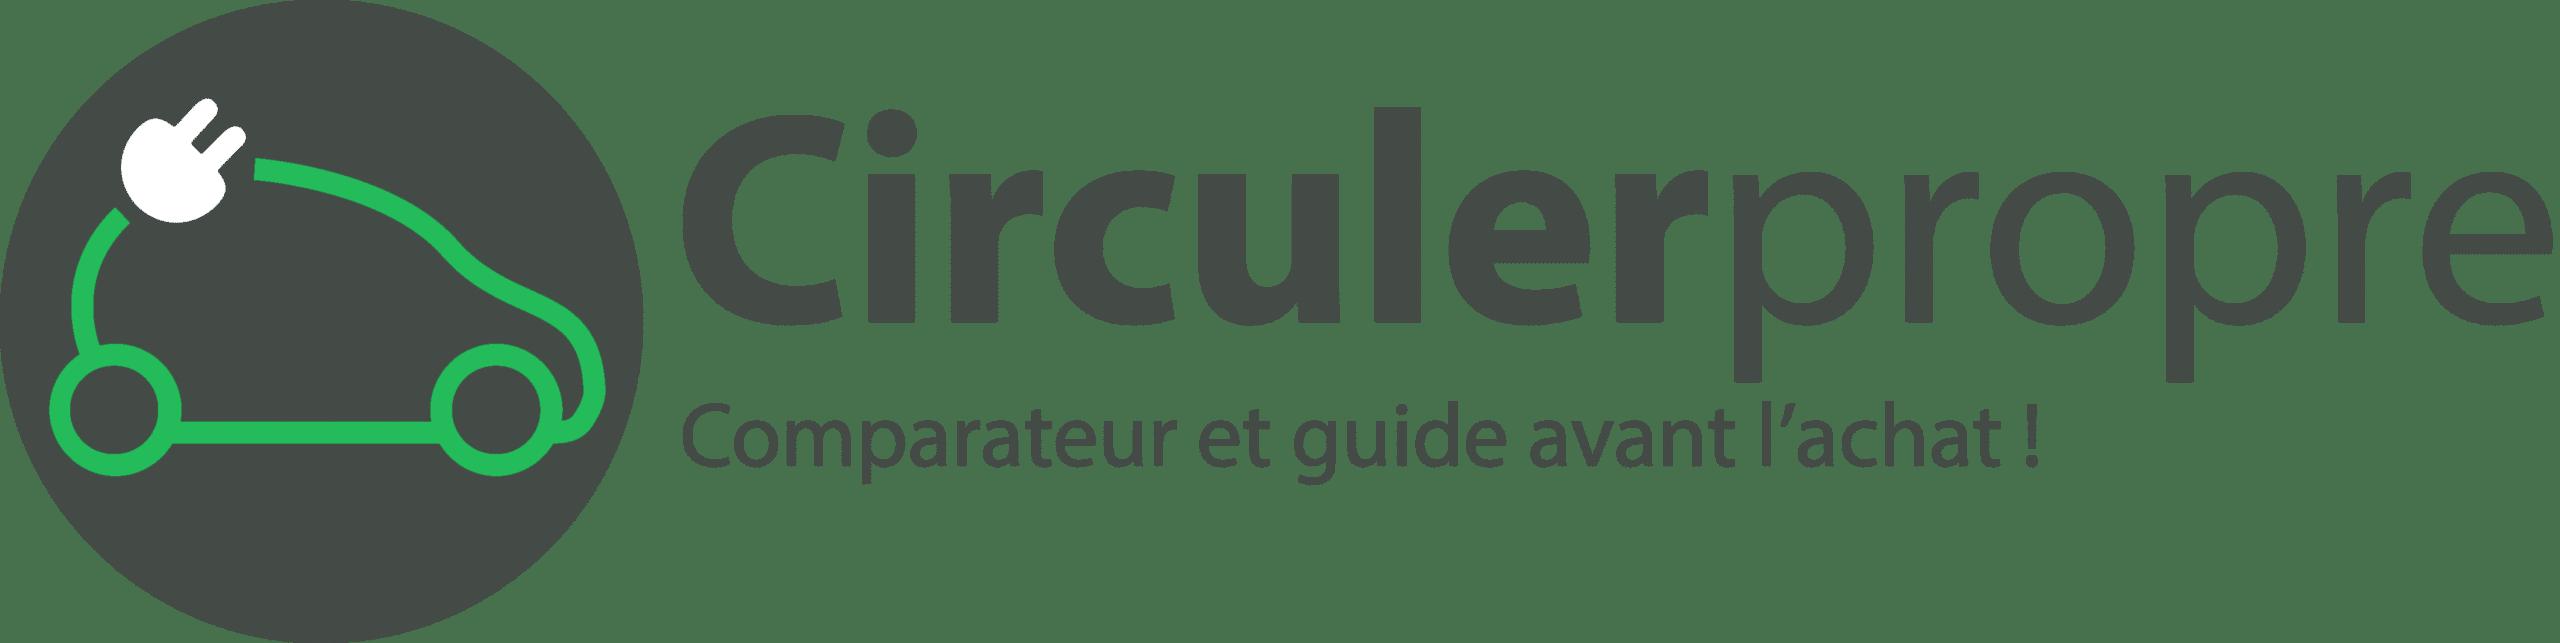 circulerpropre.fr